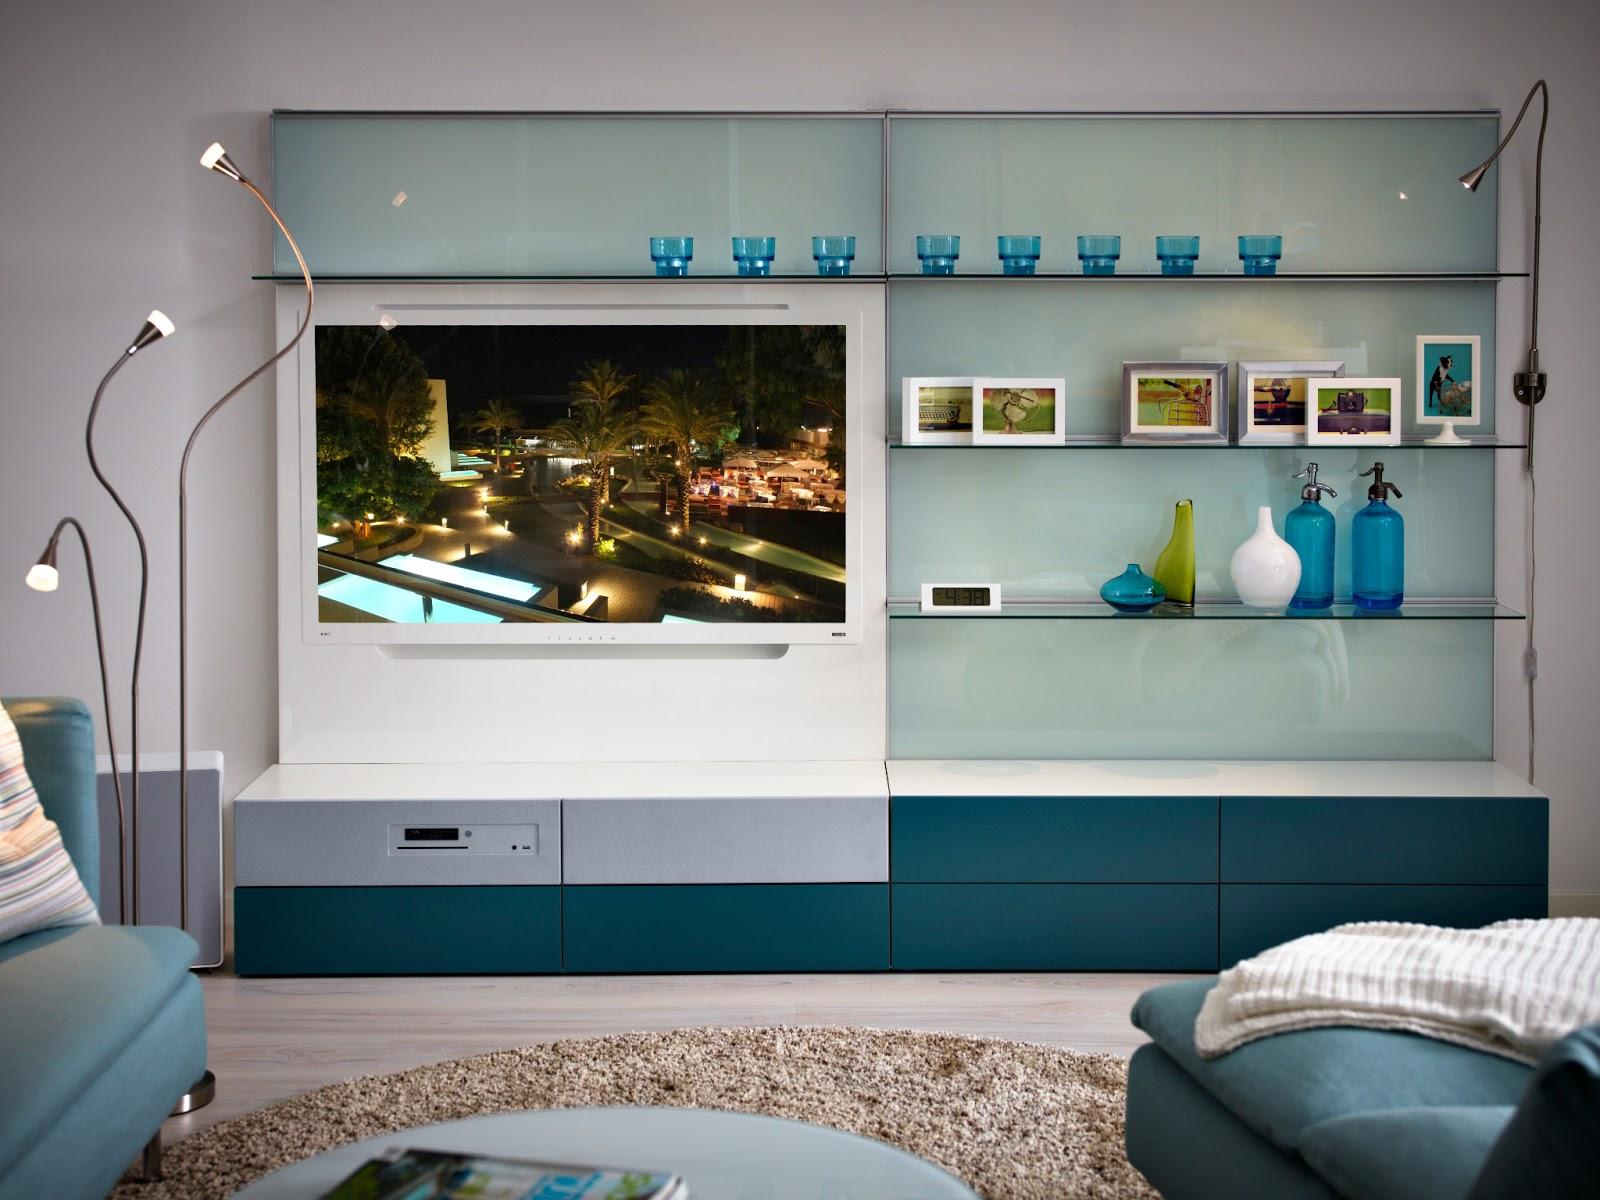 Furnitures uppleva mueble todo en uno by ikea virlova style - Mueble television ikea ...